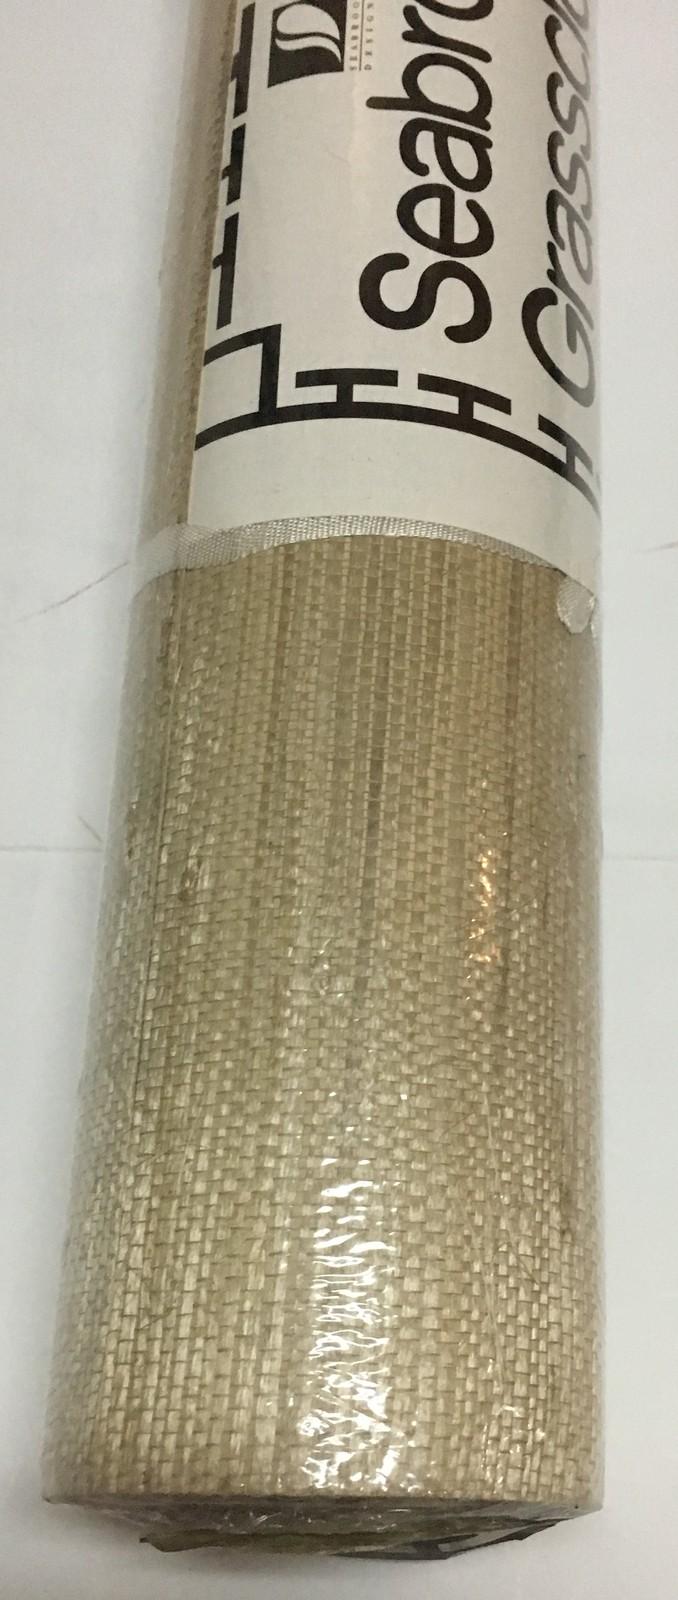 Seabrook Tan Grasscloth Wallpaper DOUBLE ROLL 36 in. x 8 yds. 72 sq.ft. GR367Z